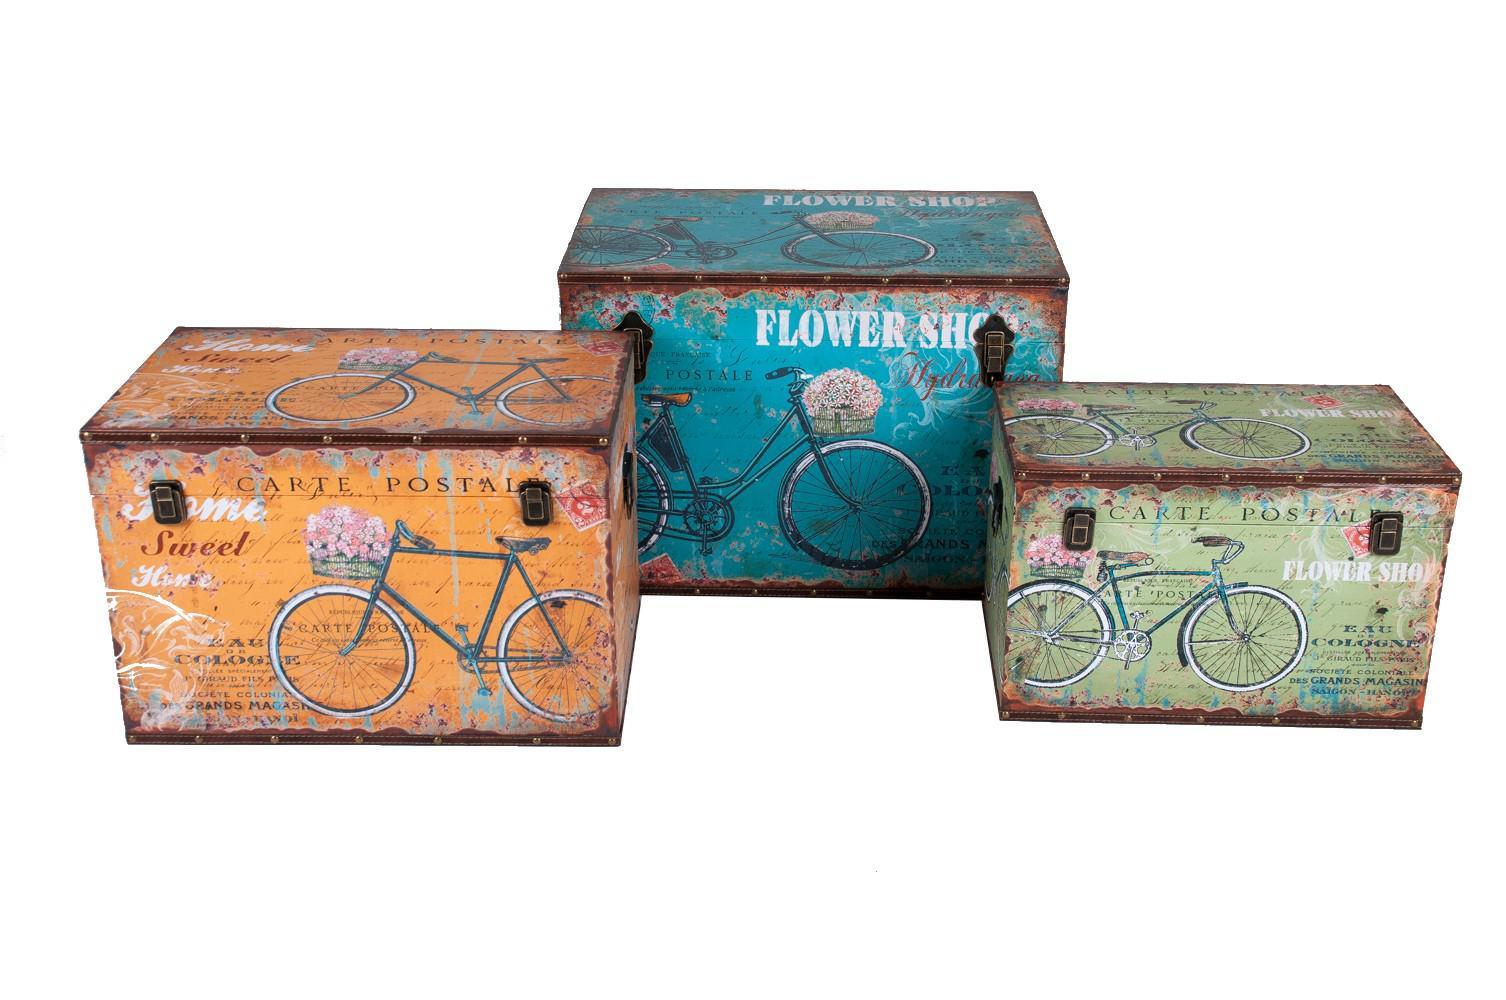 holztruhe fahrraddesign vintage holzkiste holztruhe truhe kiste aufbewahrungsbox kaufen bei. Black Bedroom Furniture Sets. Home Design Ideas